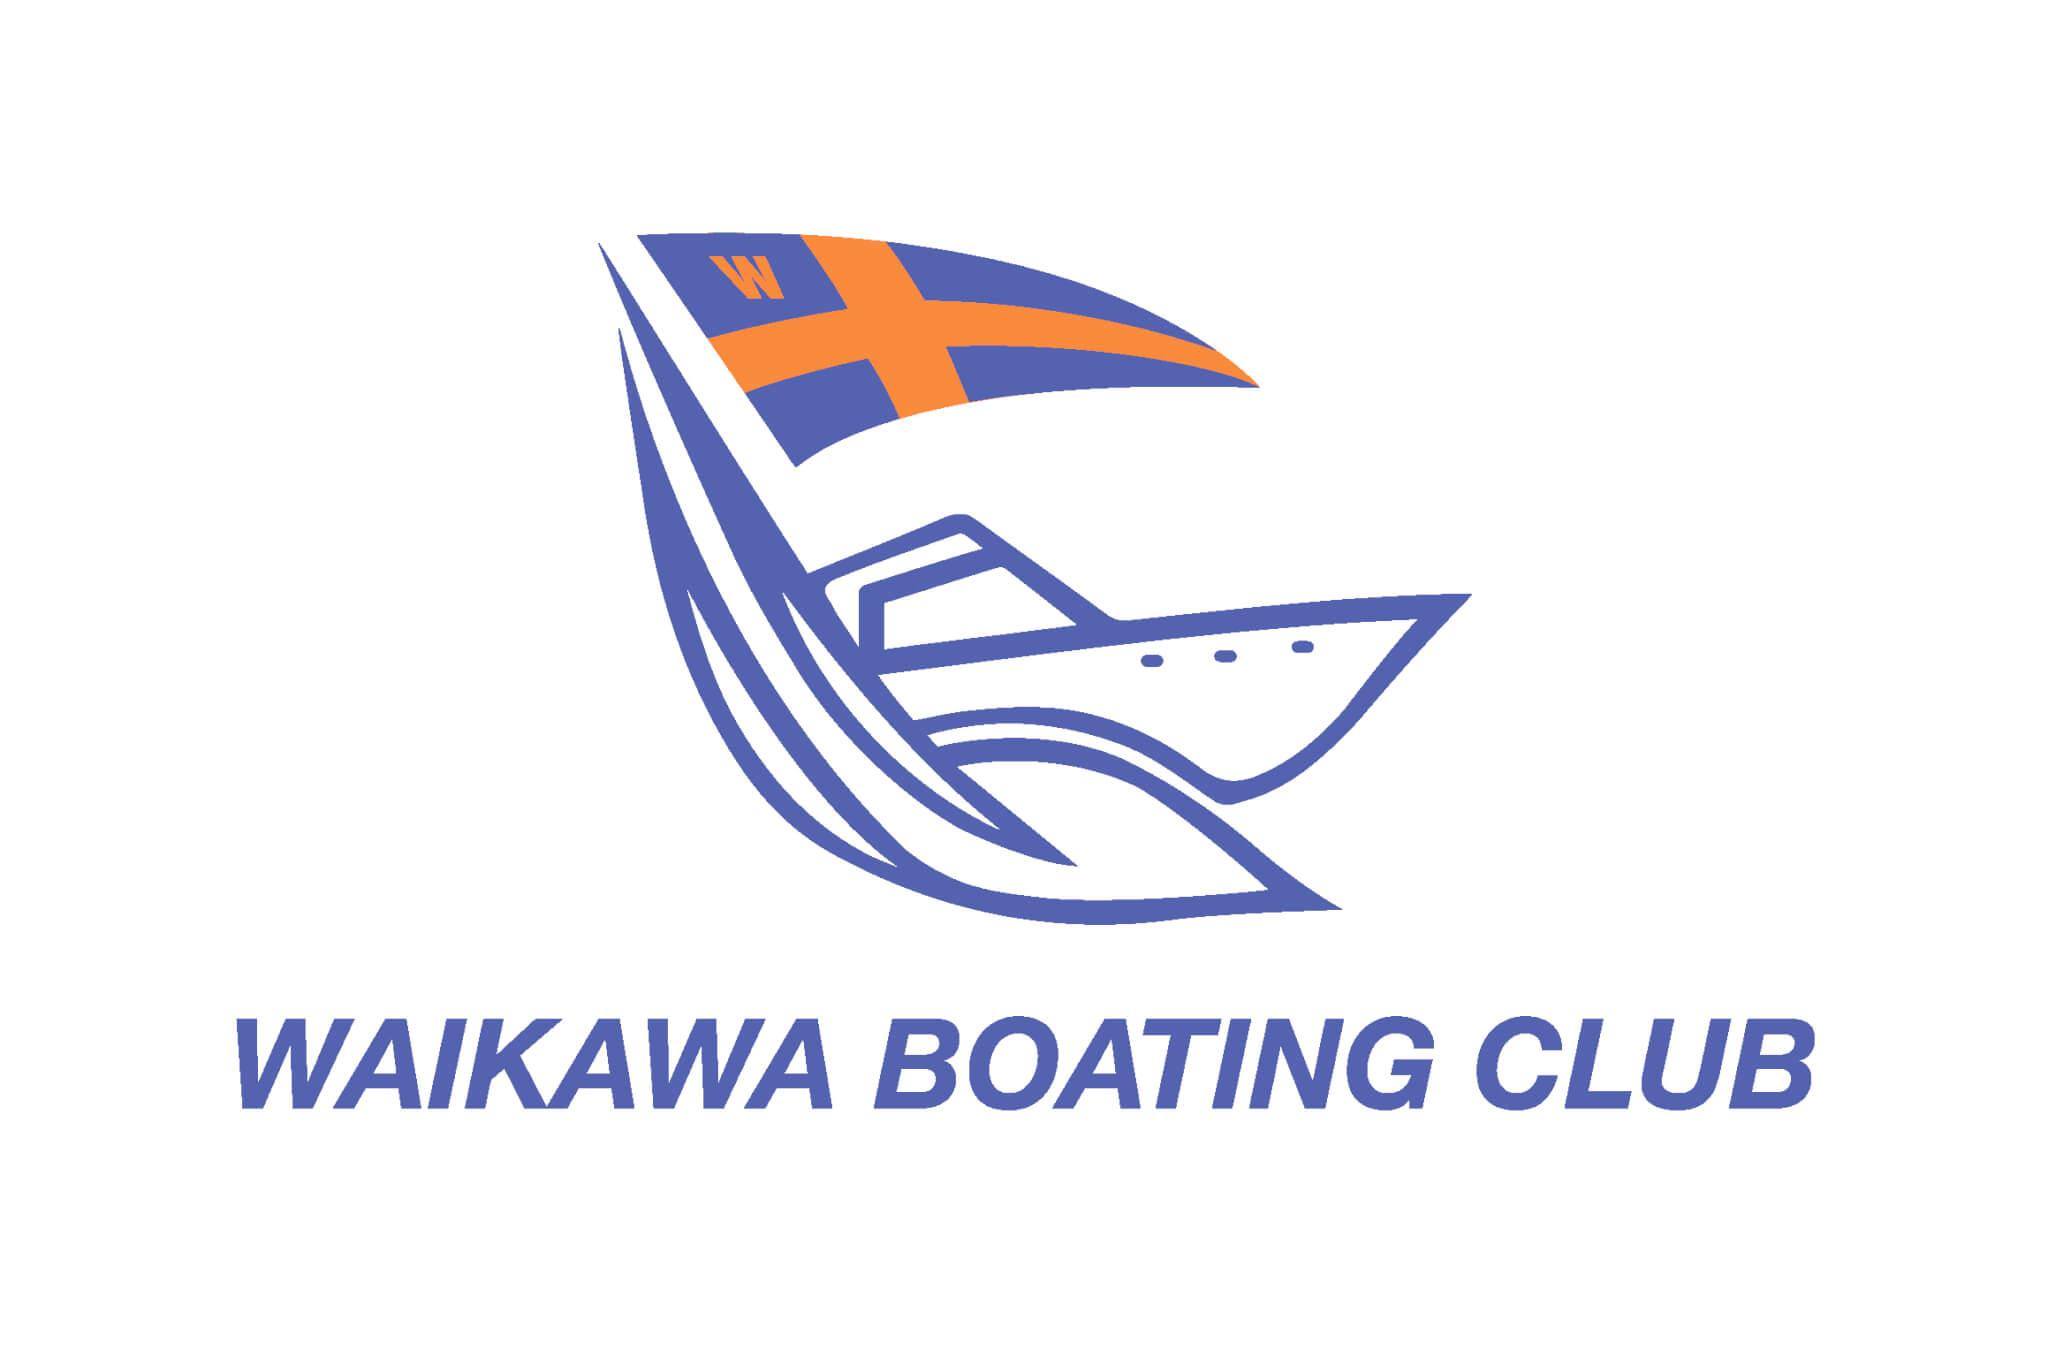 waikawa-boating-club-cmyk